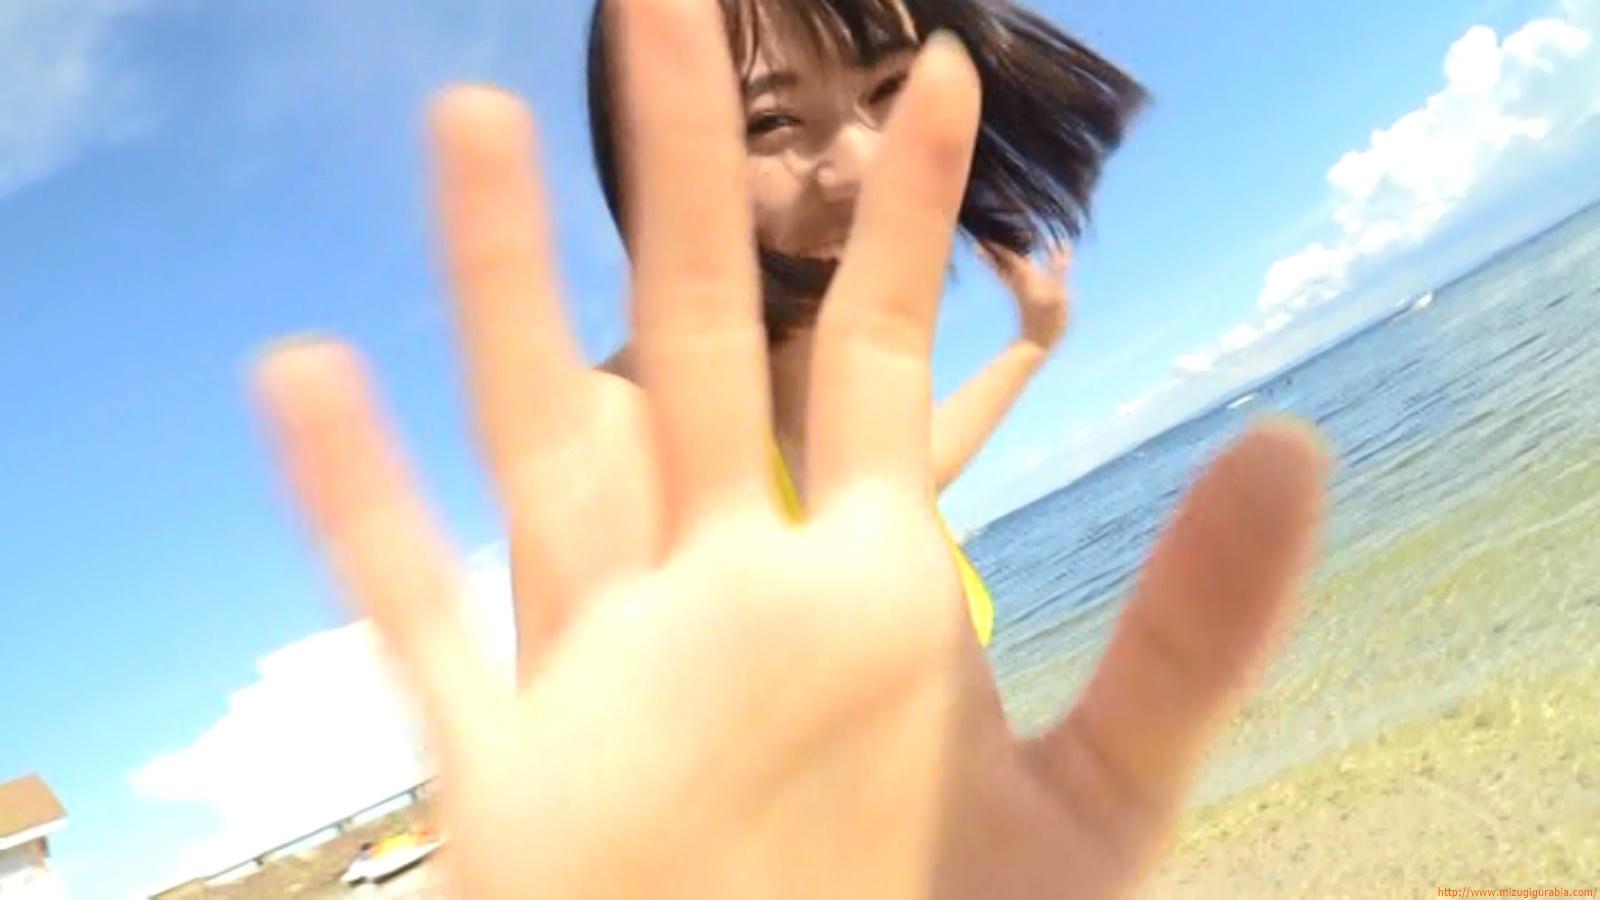 Beach dating156